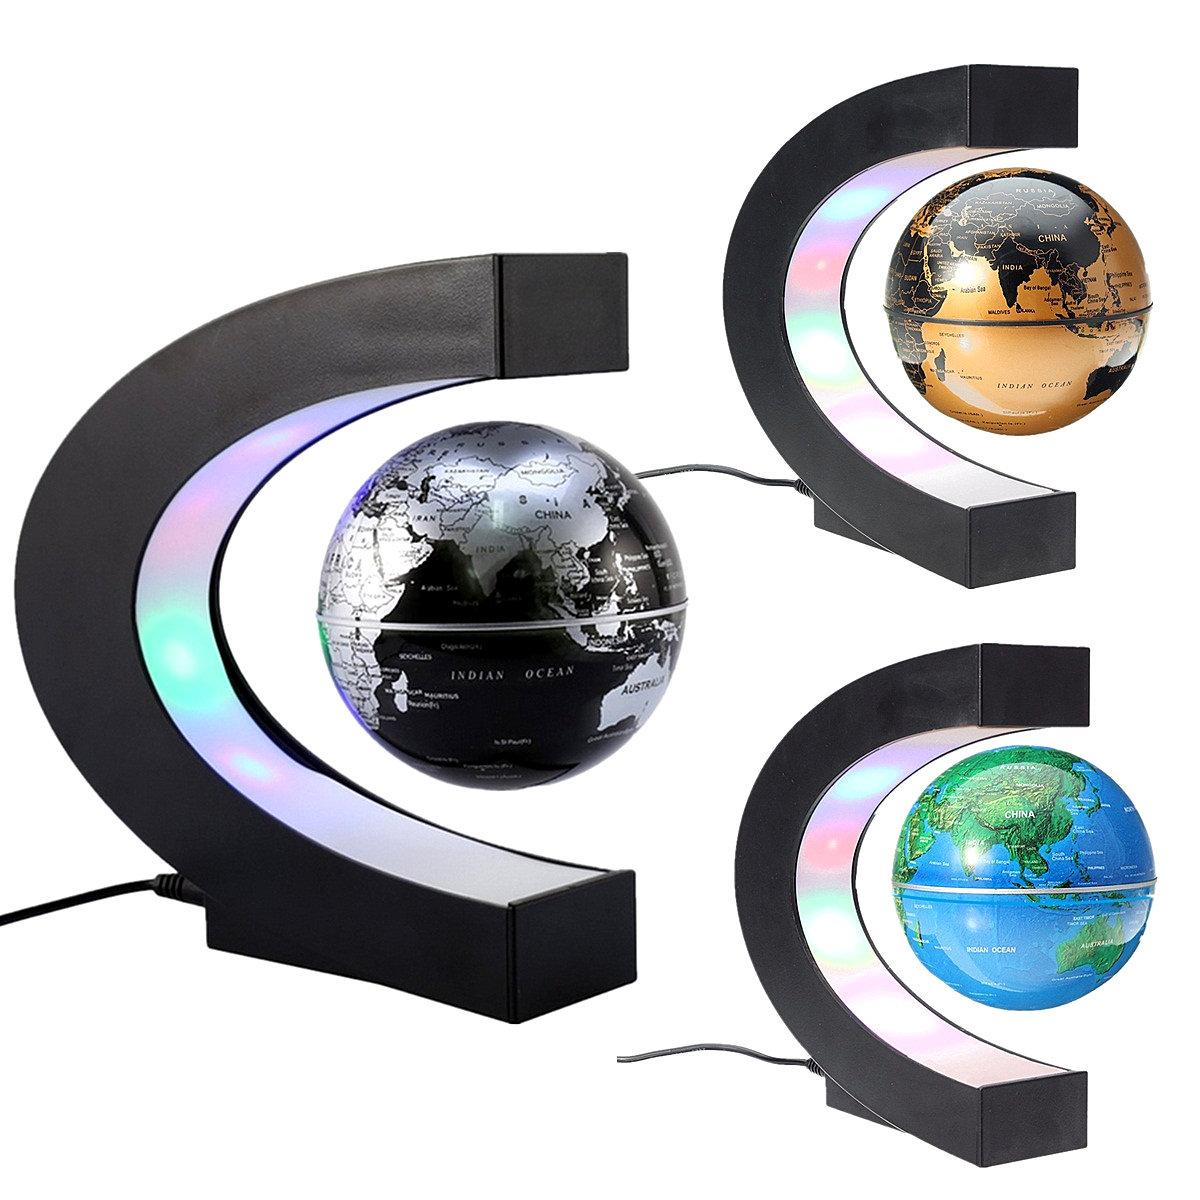 Led tellurion c shape magnetic levitation floating globe world map led tellurion c shape magnetic levitation floating globe world map charming science home decor gumiabroncs Gallery